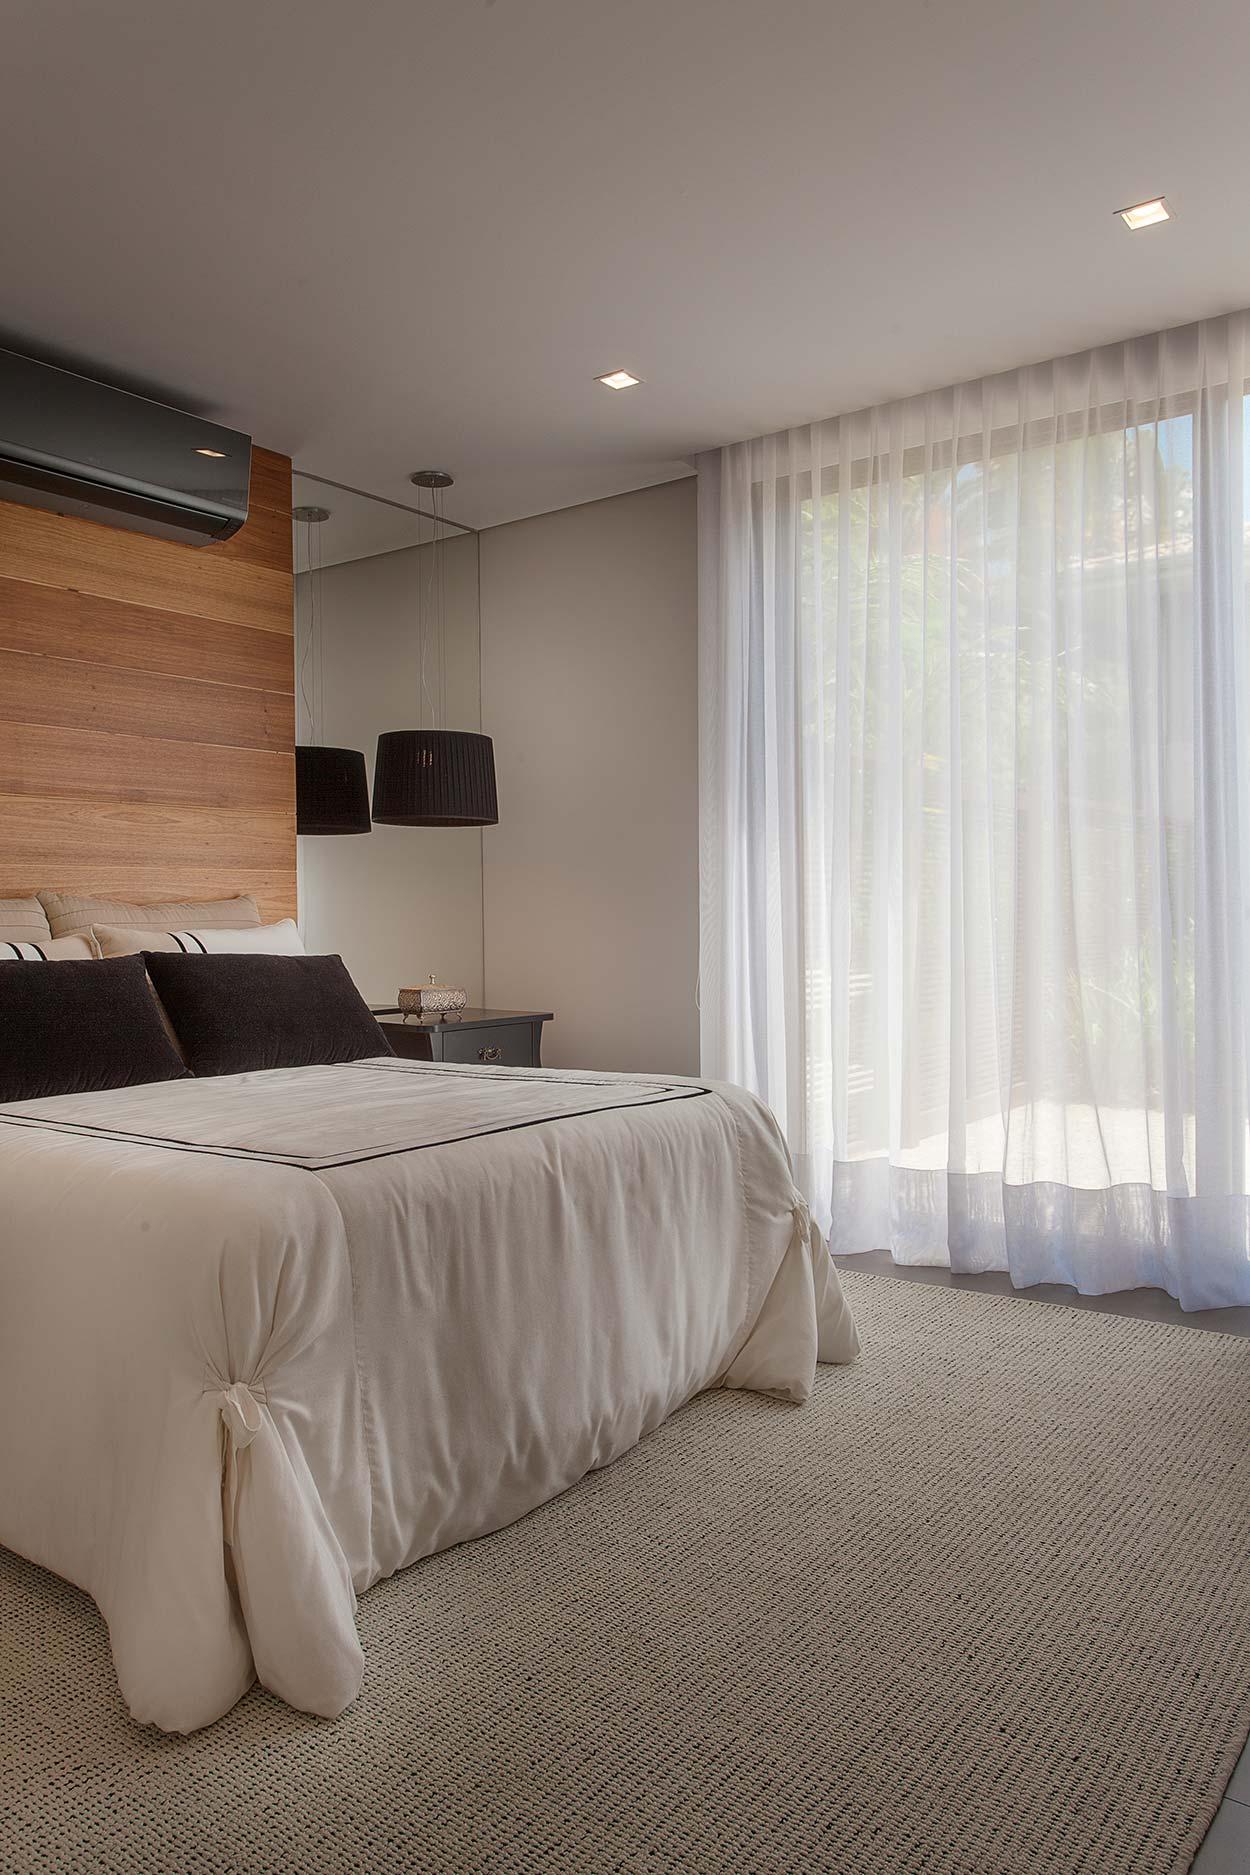 veridianaperes-interiores-Residencia-ER31